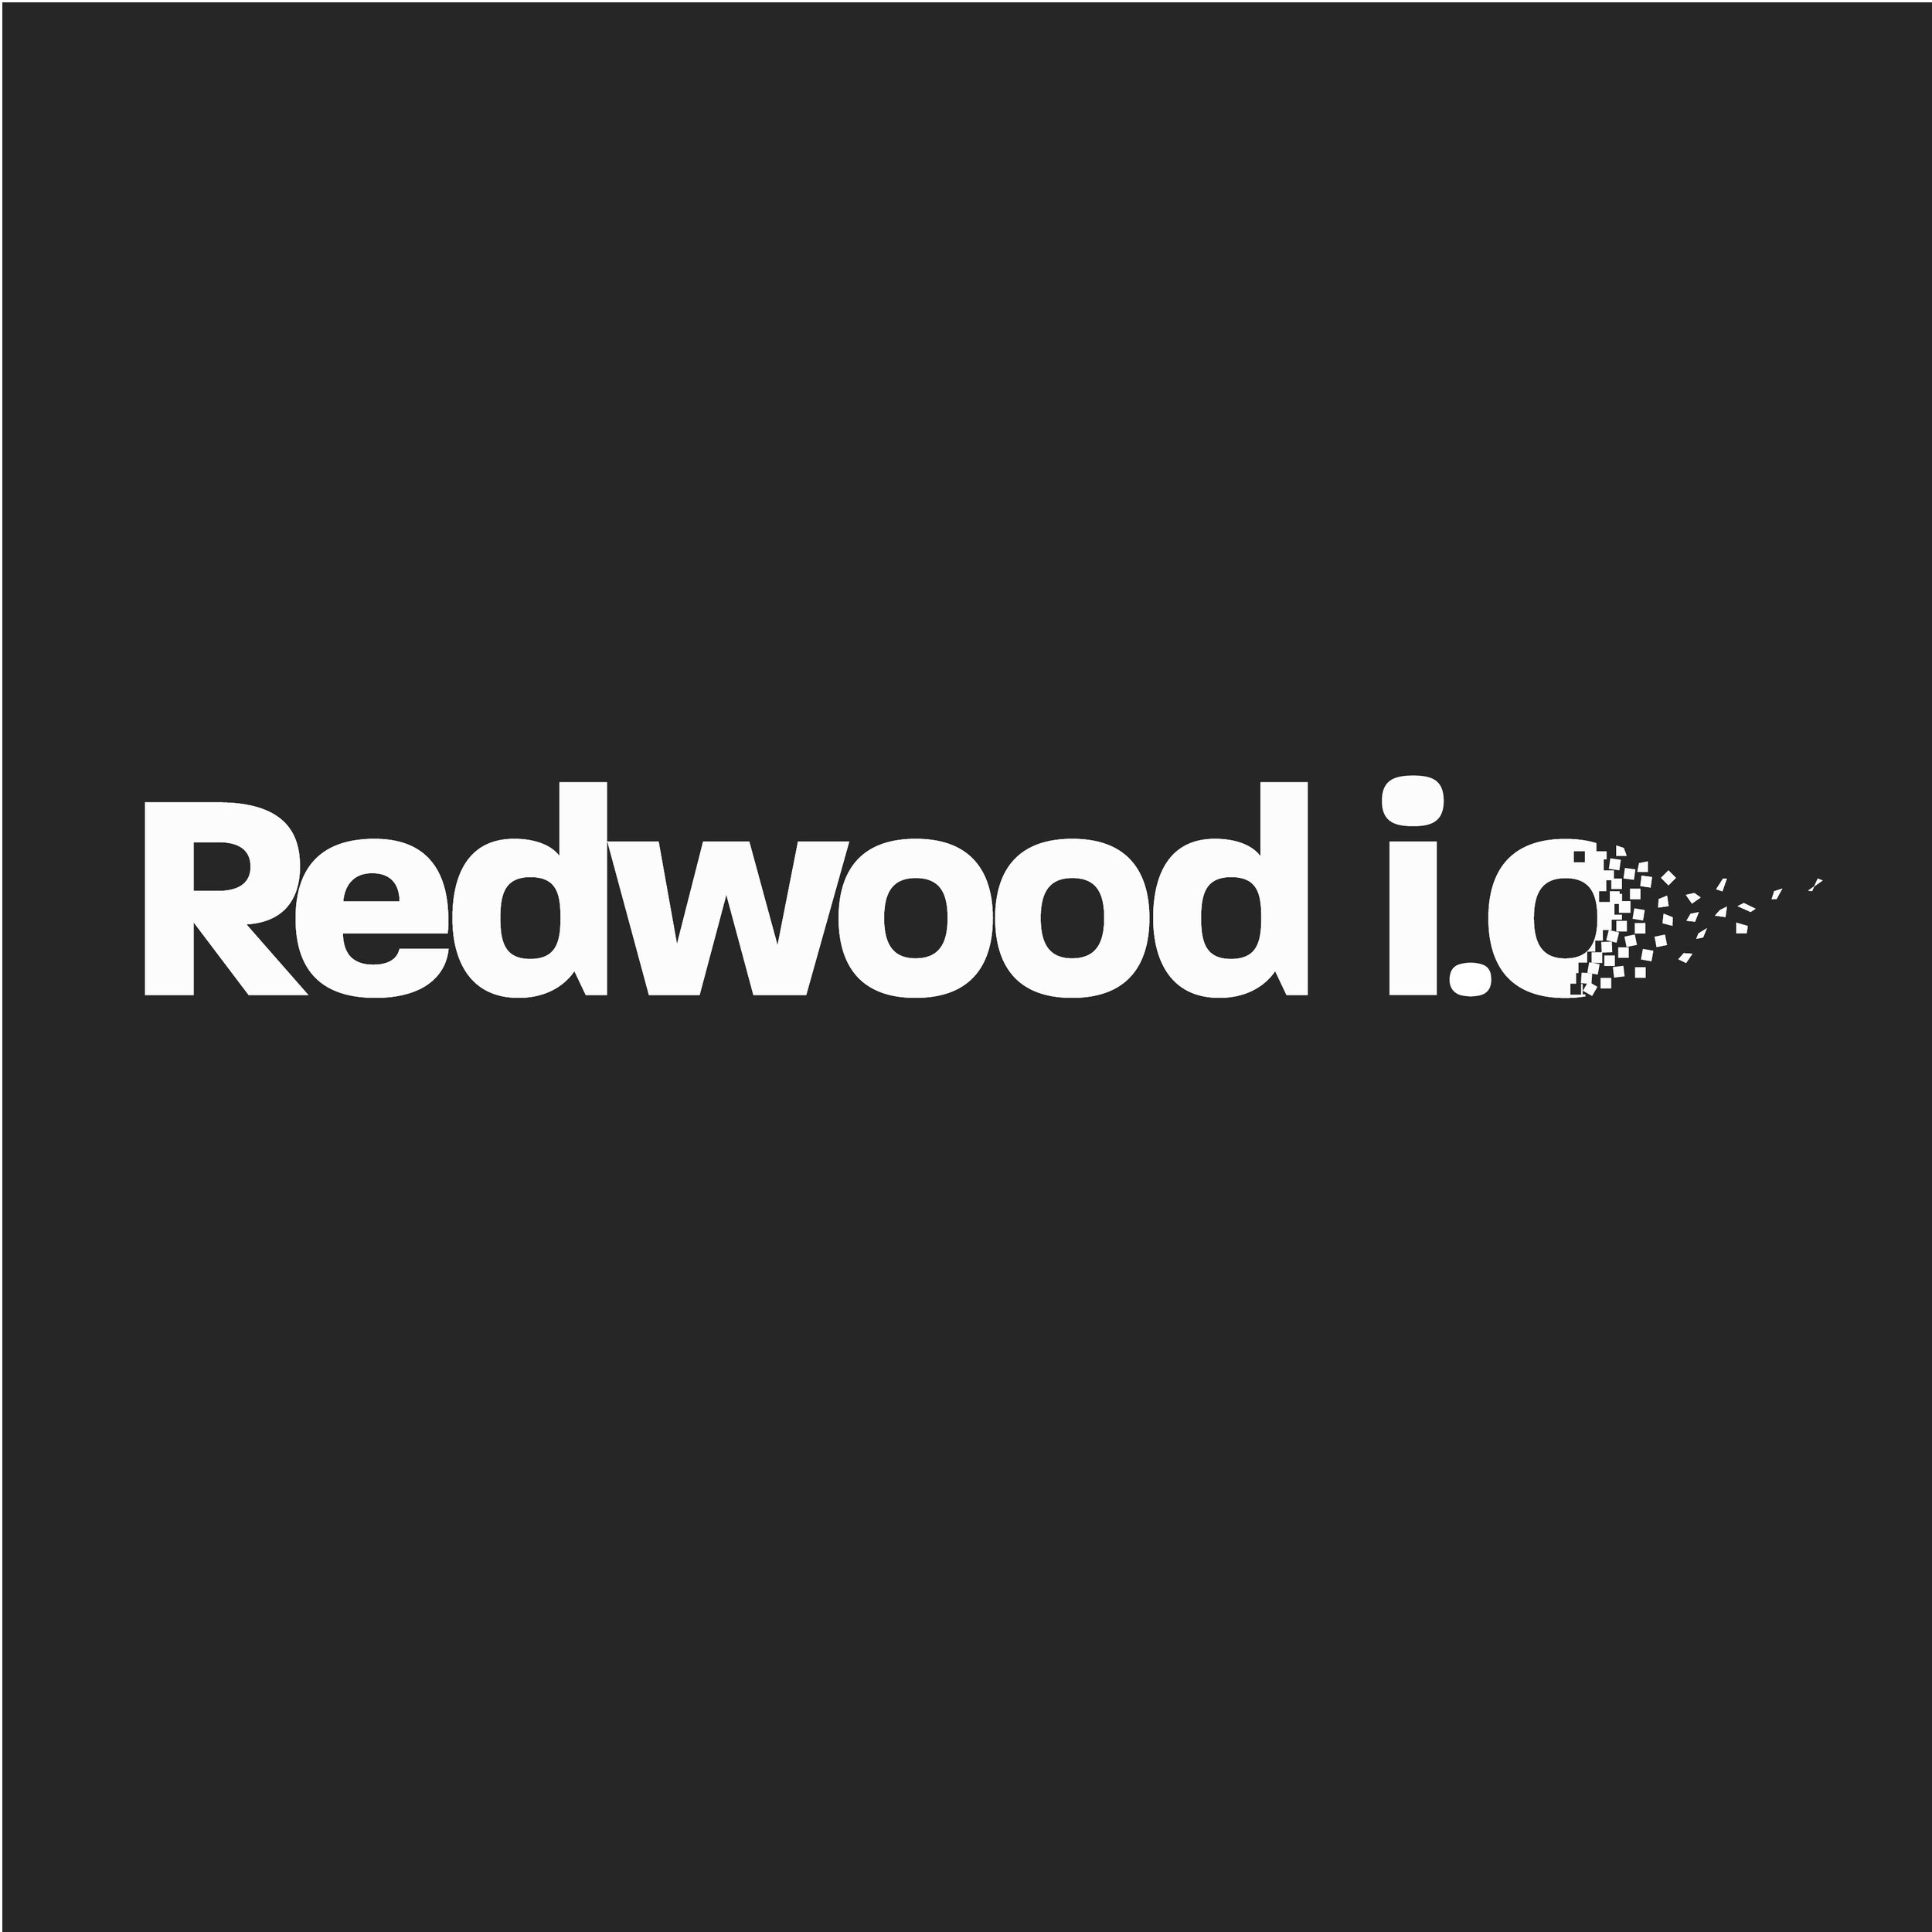 Redwoodio_v8-01.jpg